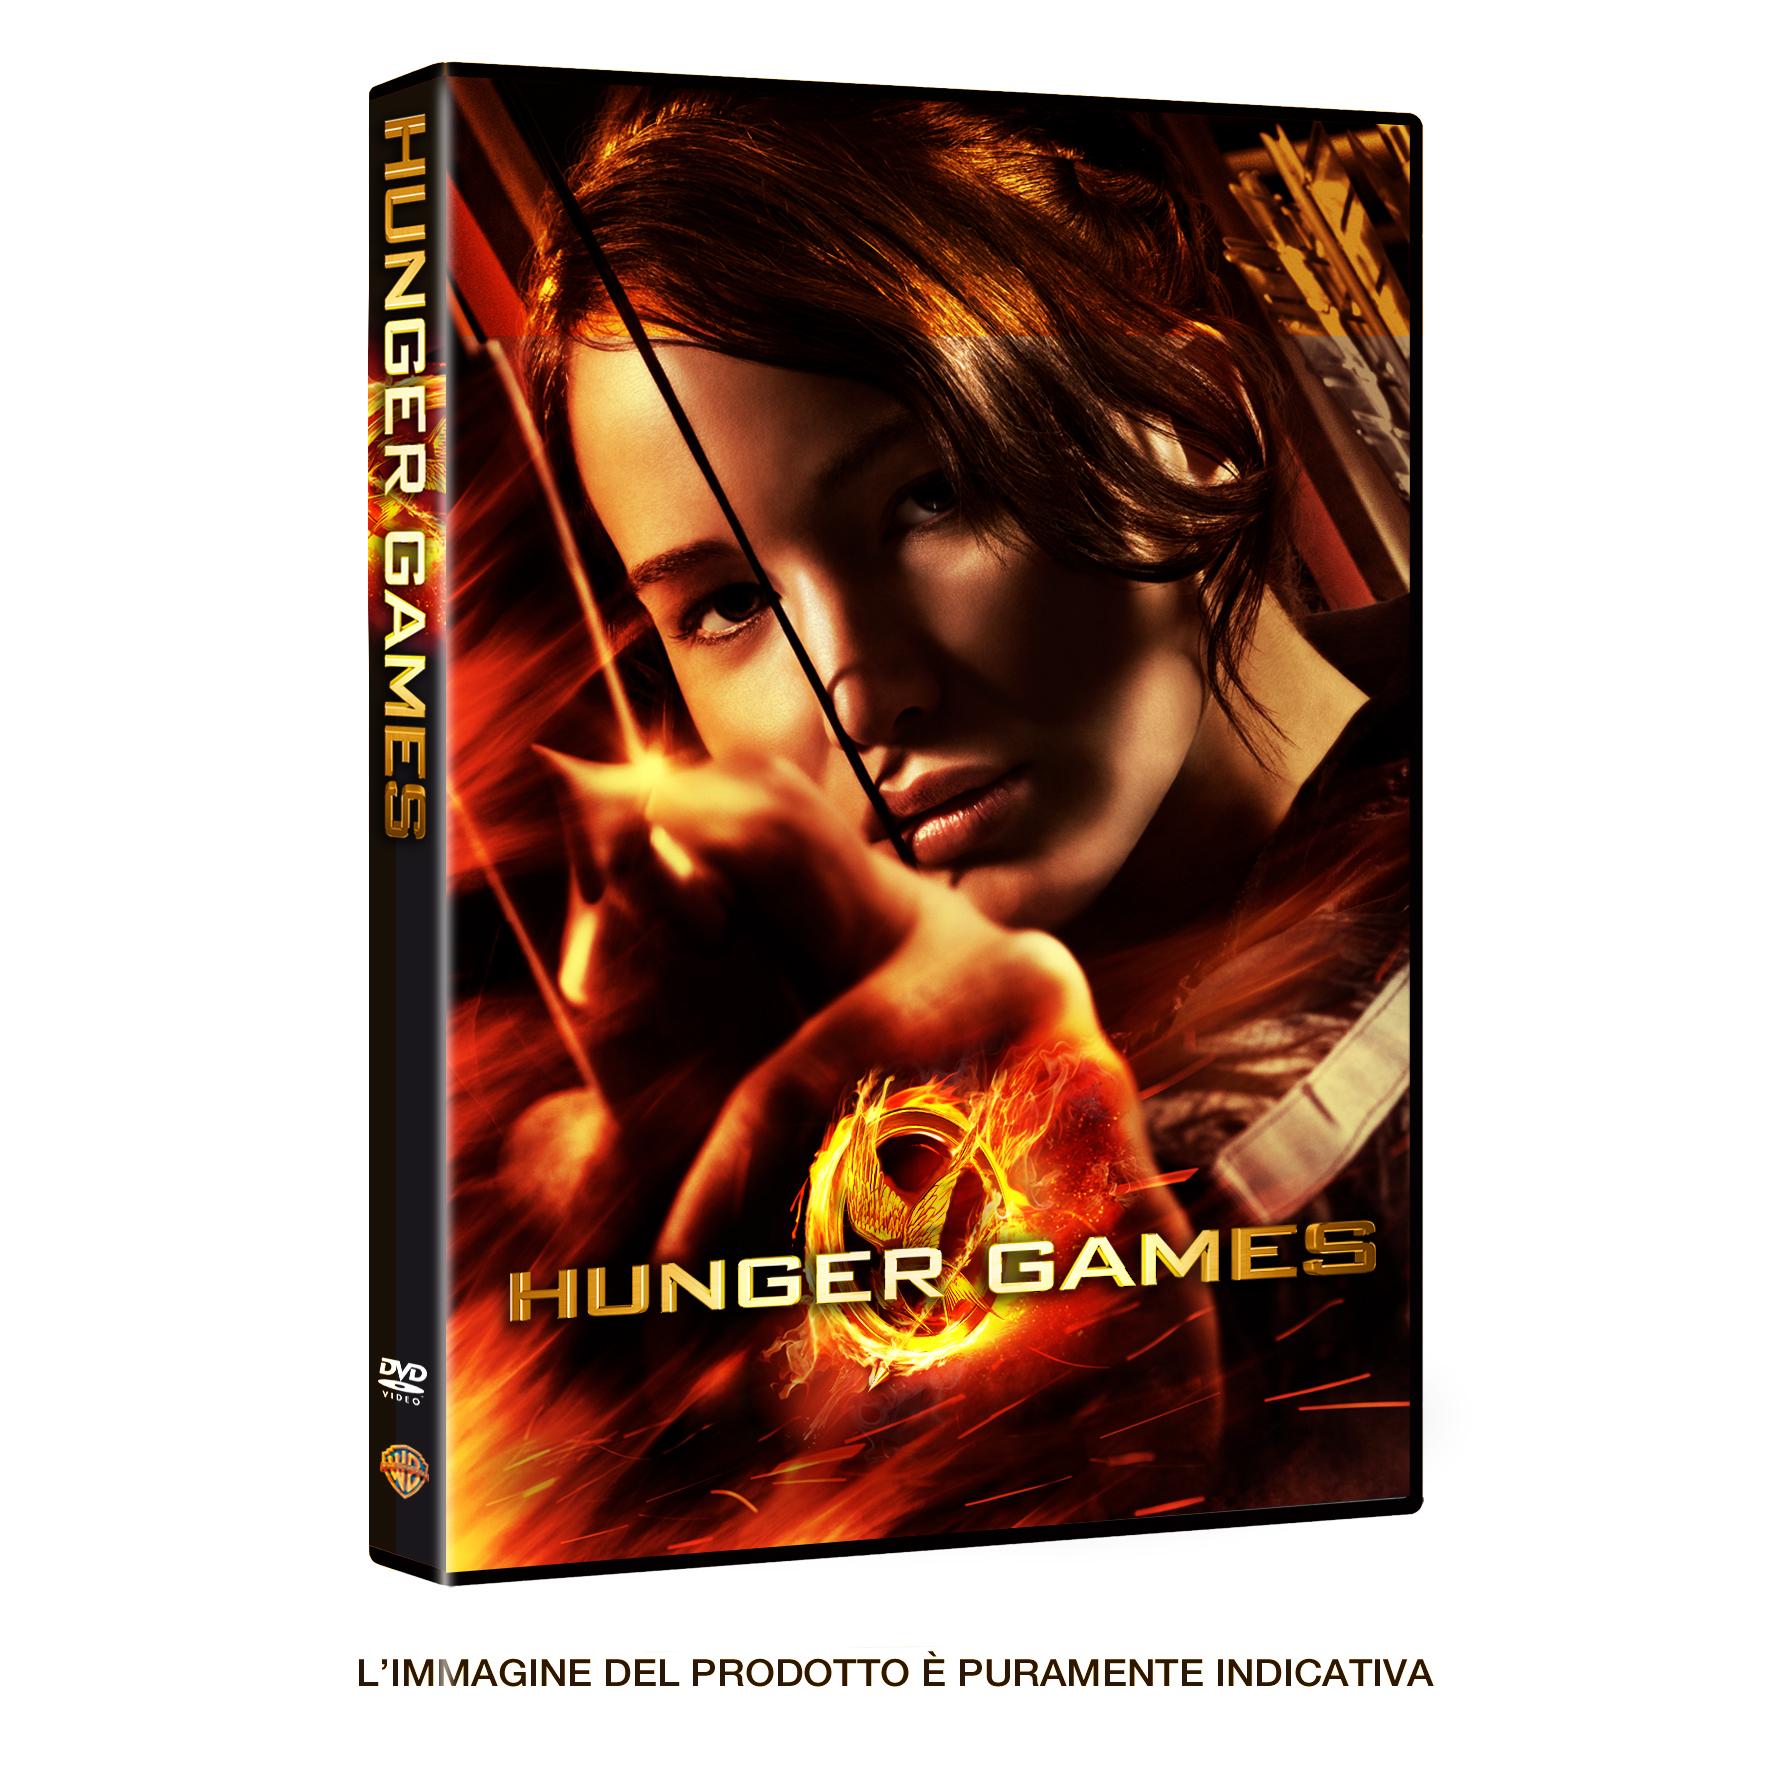 Hnger Games DVD Singolo